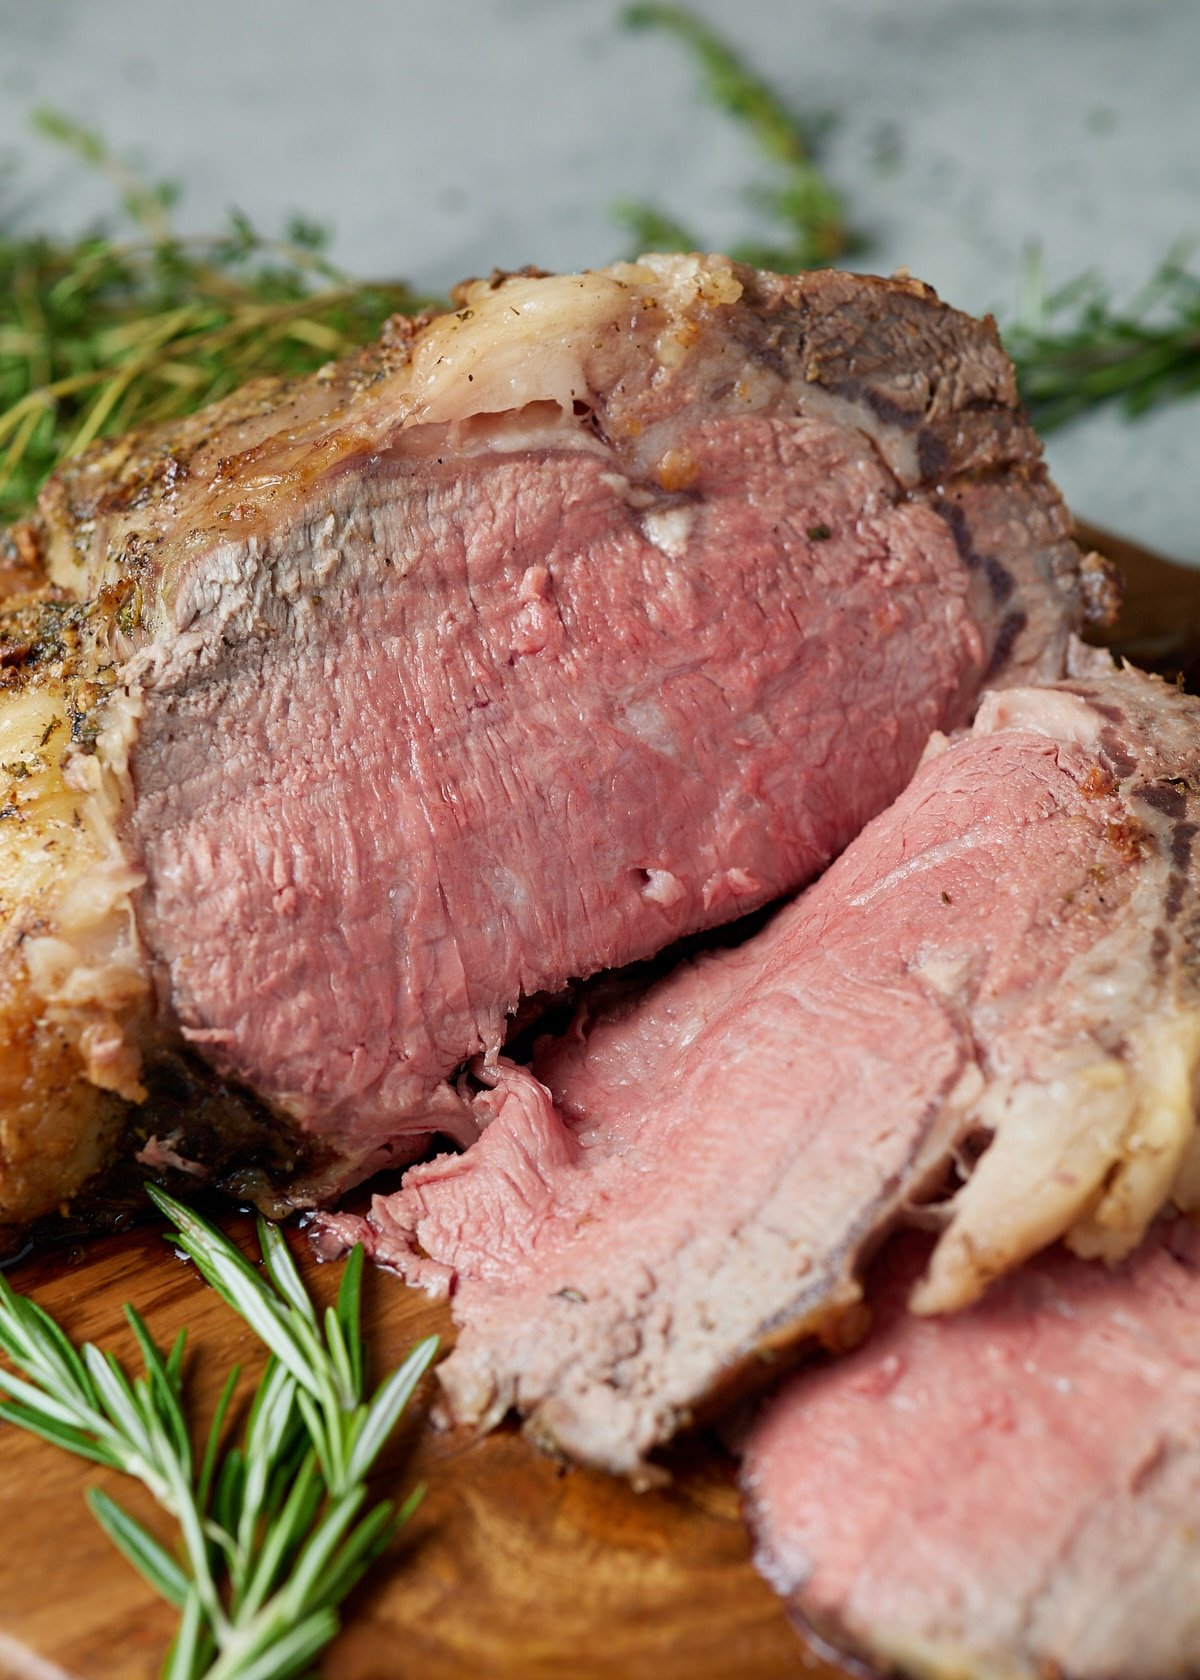 Slices cut off of the boneless roast beef.